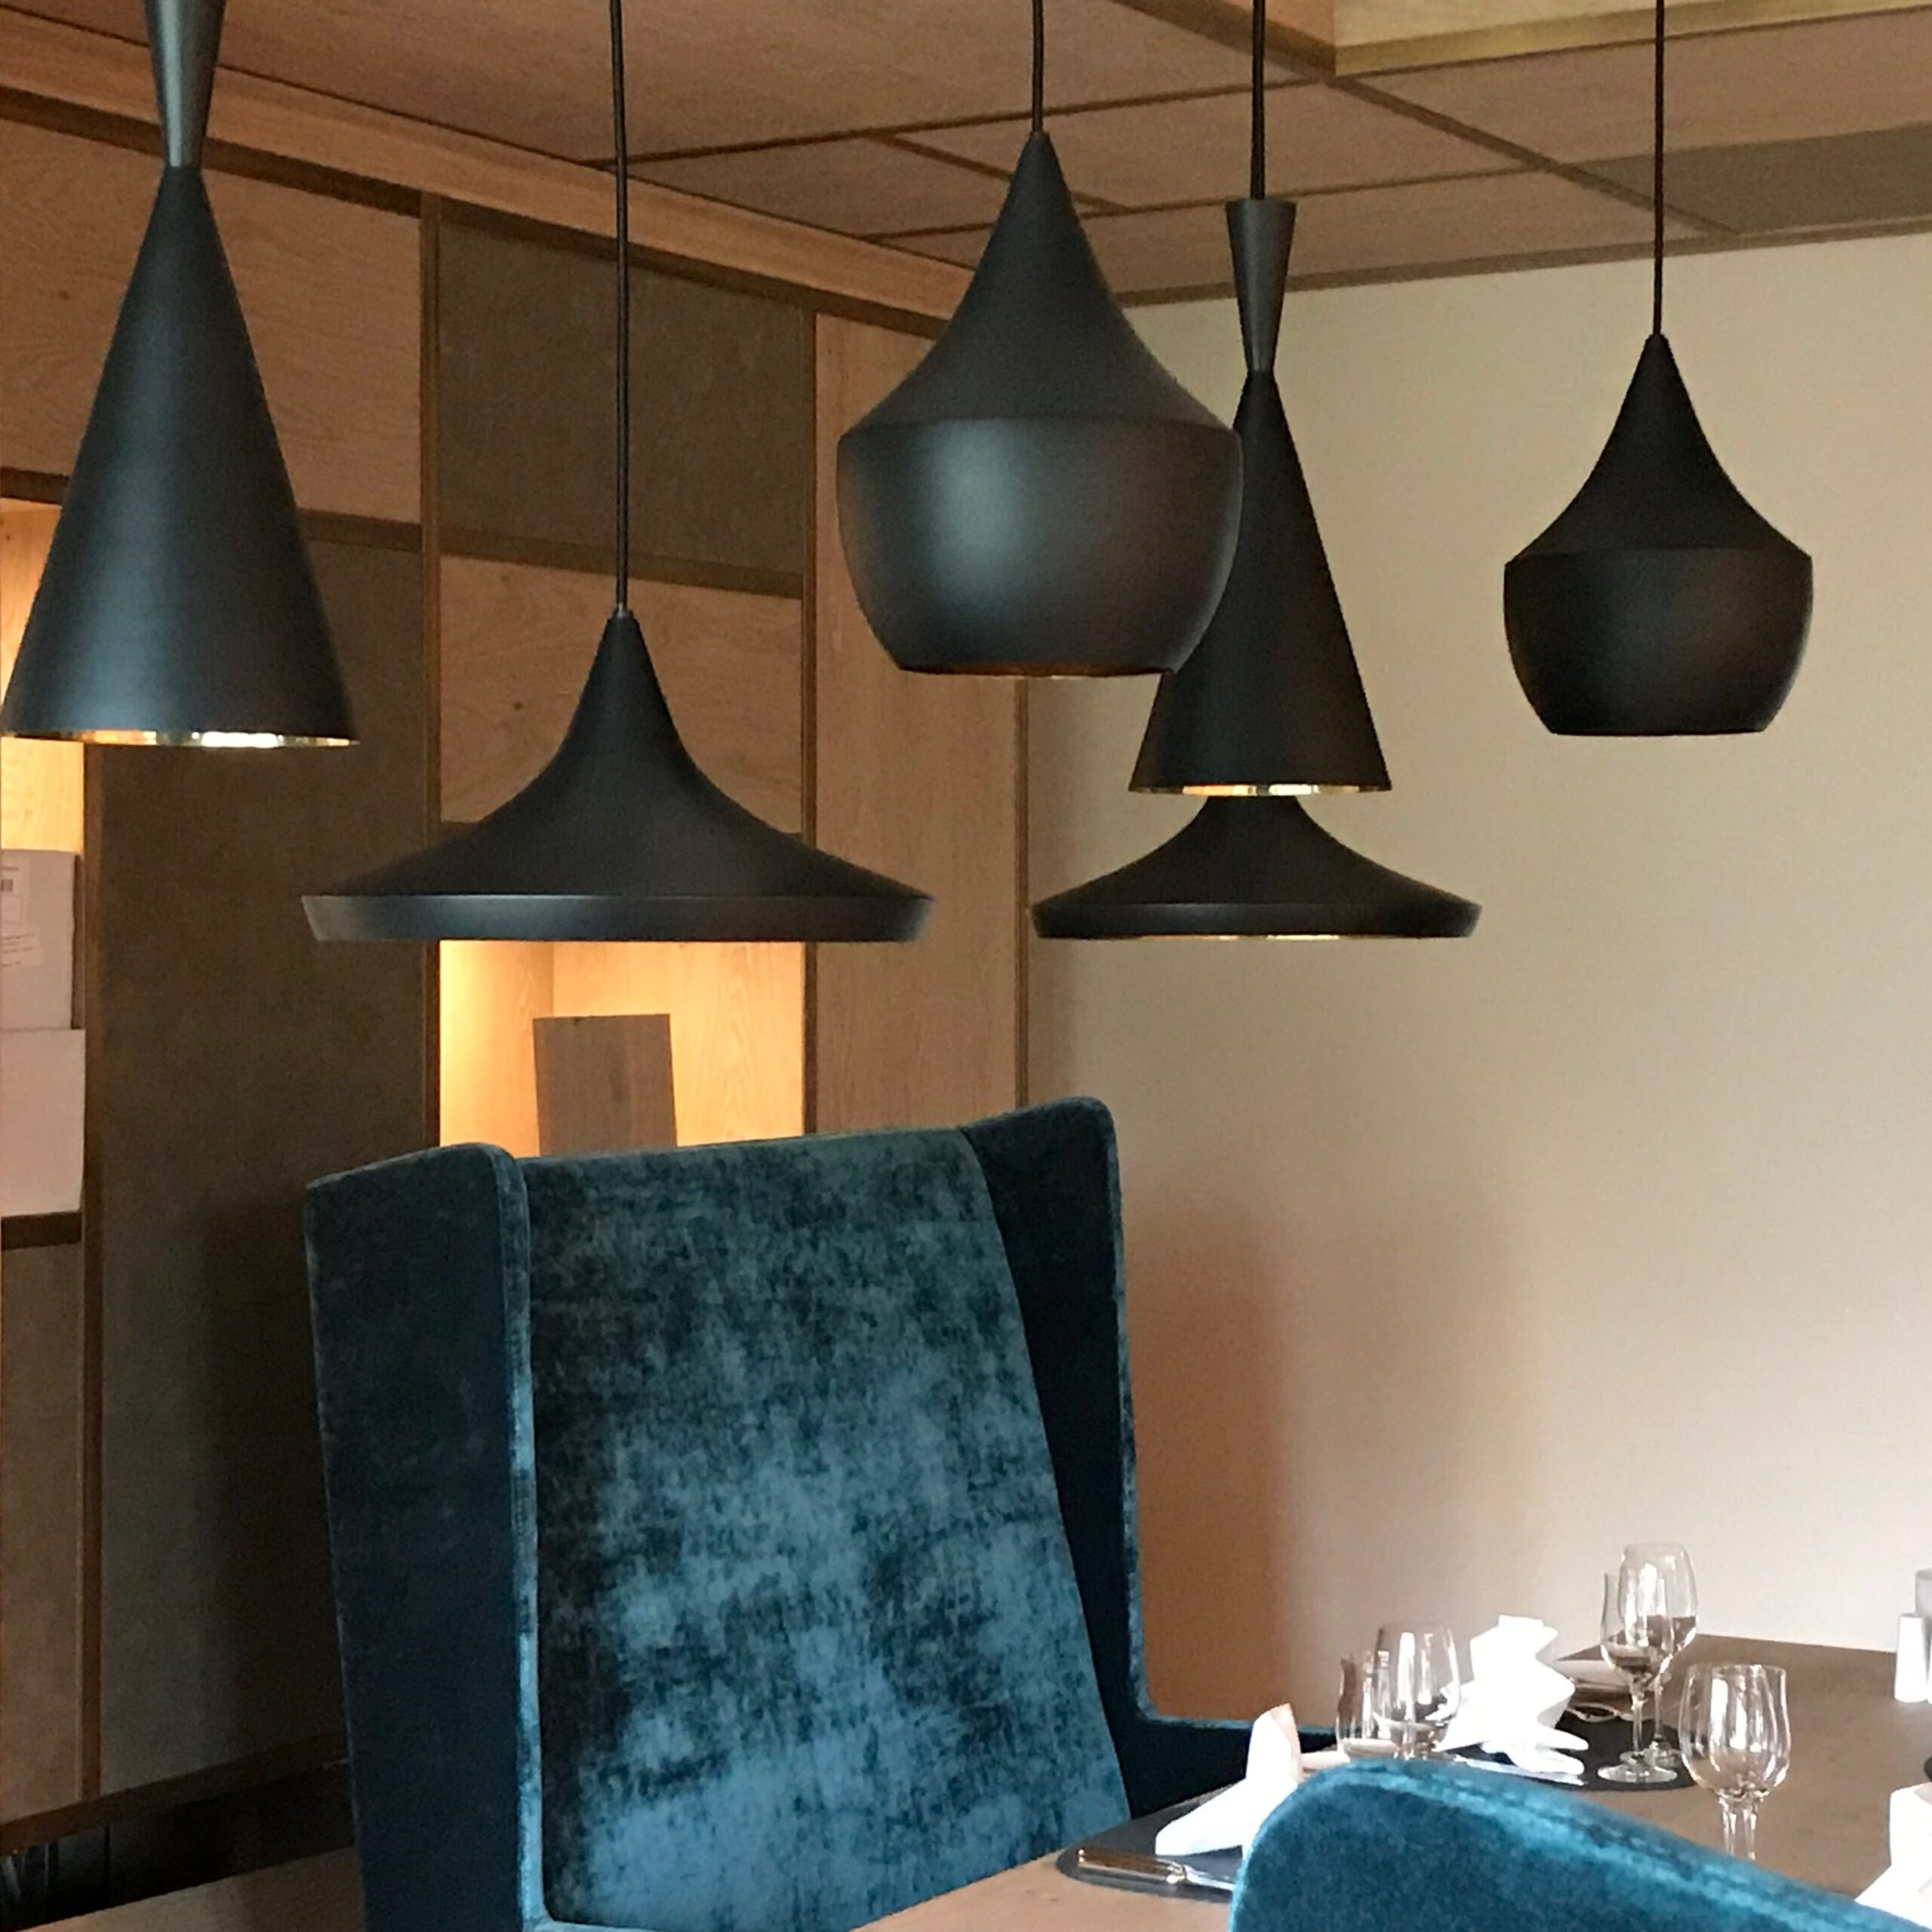 Full Size of Moderne Hängelampen Deckenlampen Deckenbeleuchtung Esszimmerbeleuchtung Duschen Modernes Sofa Bett Esstische 180x200 Landhausküche Deckenleuchte Wohnzimmer Wohnzimmer Moderne Hängelampen